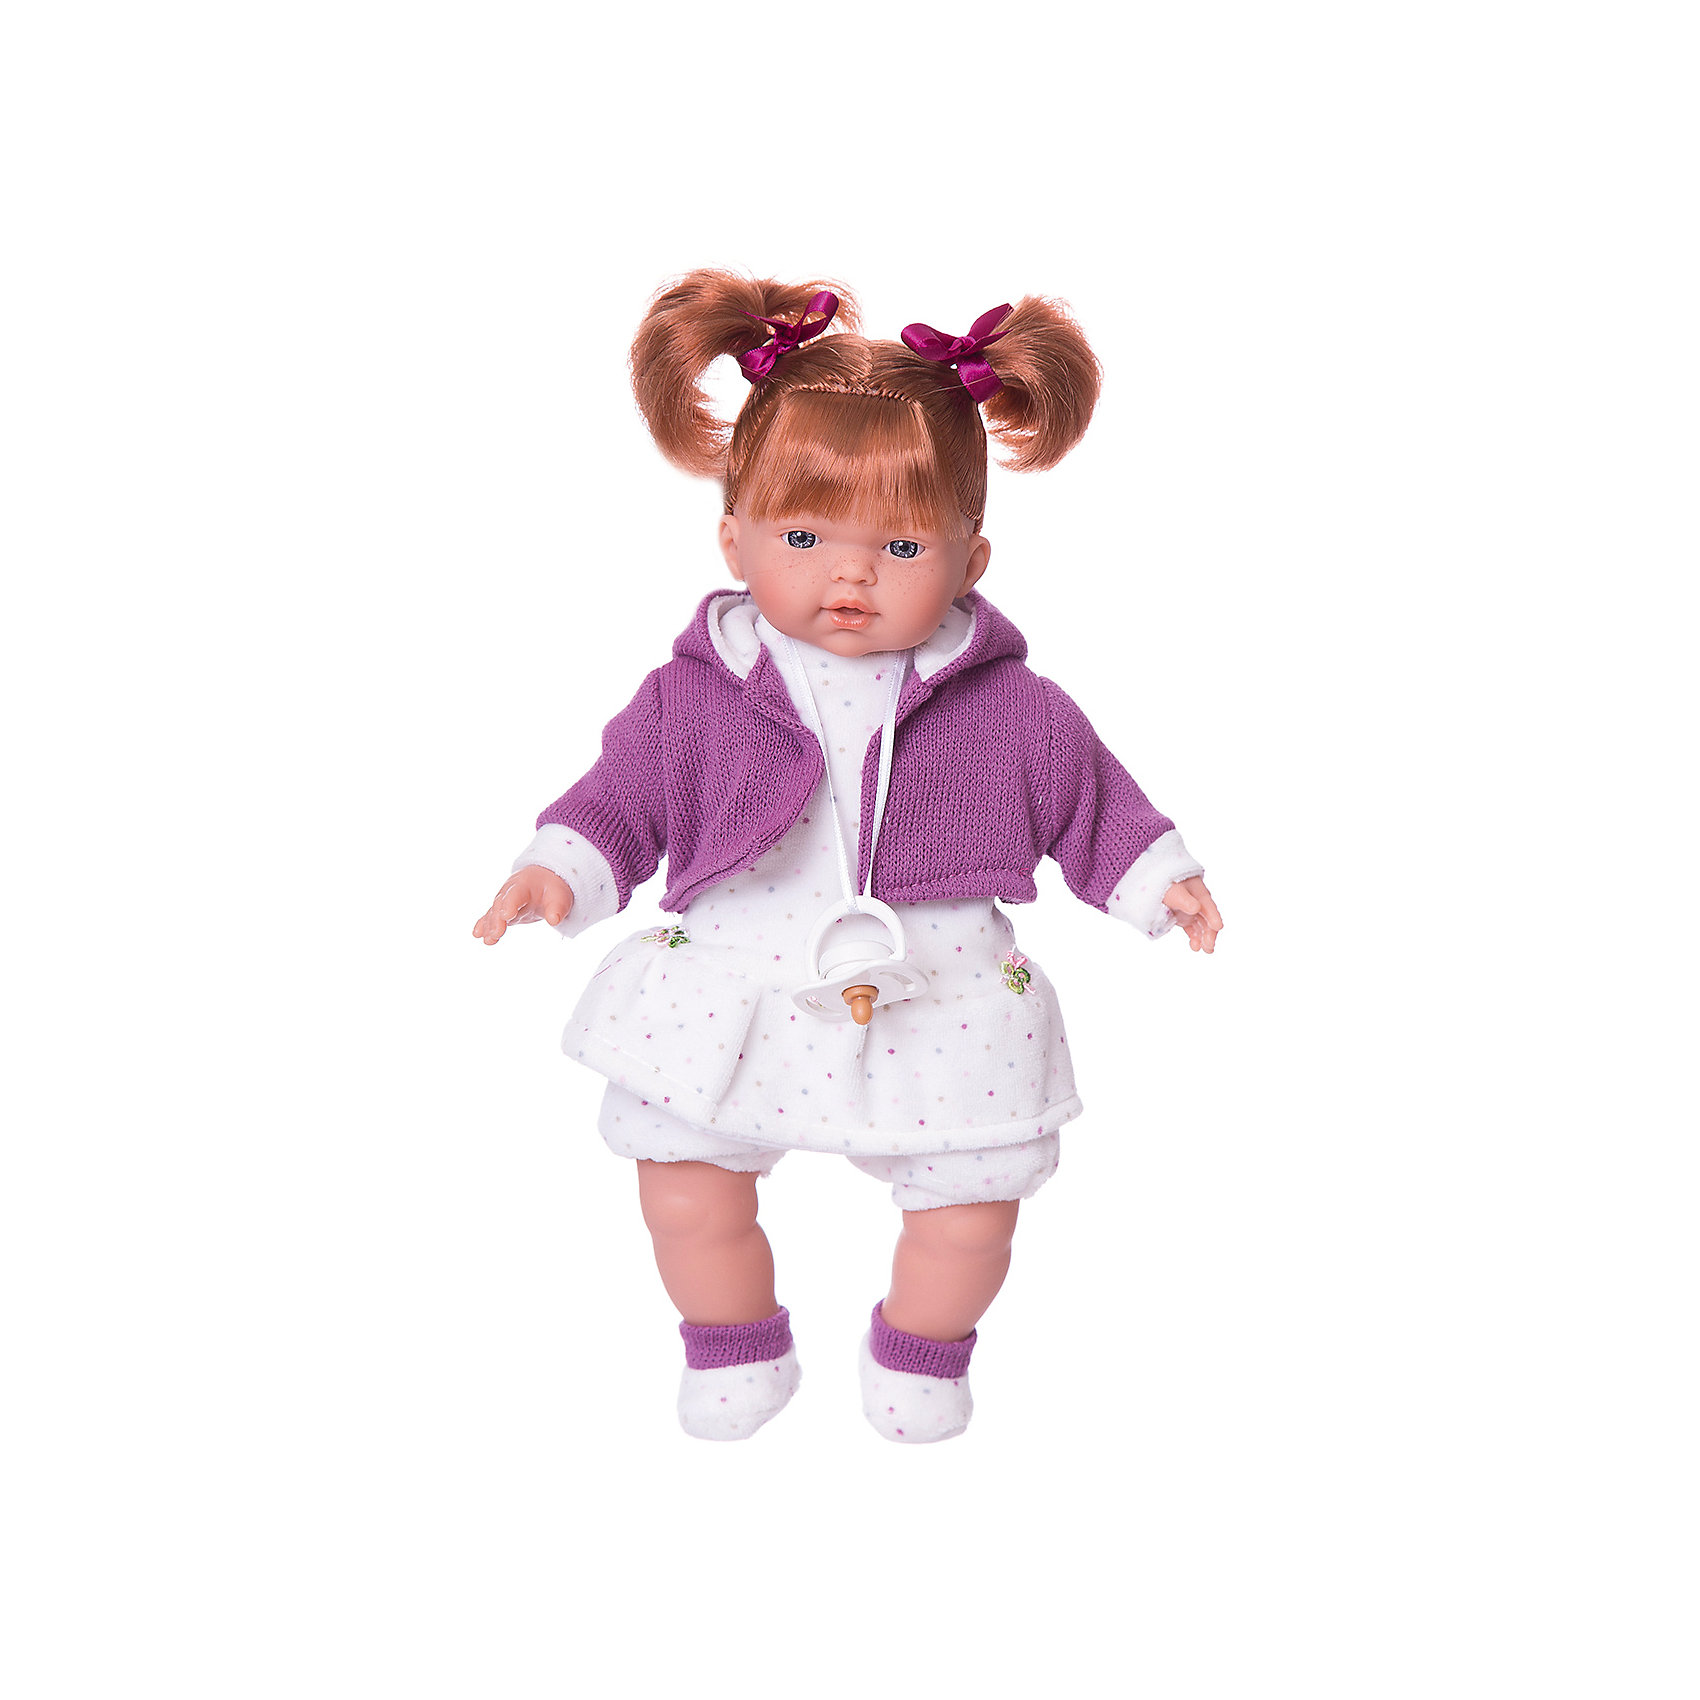 Llorens Кукла Алиса, 33 см, Llorens куклы и одежда для кукол llorens кукла алиса 33 см со звуком